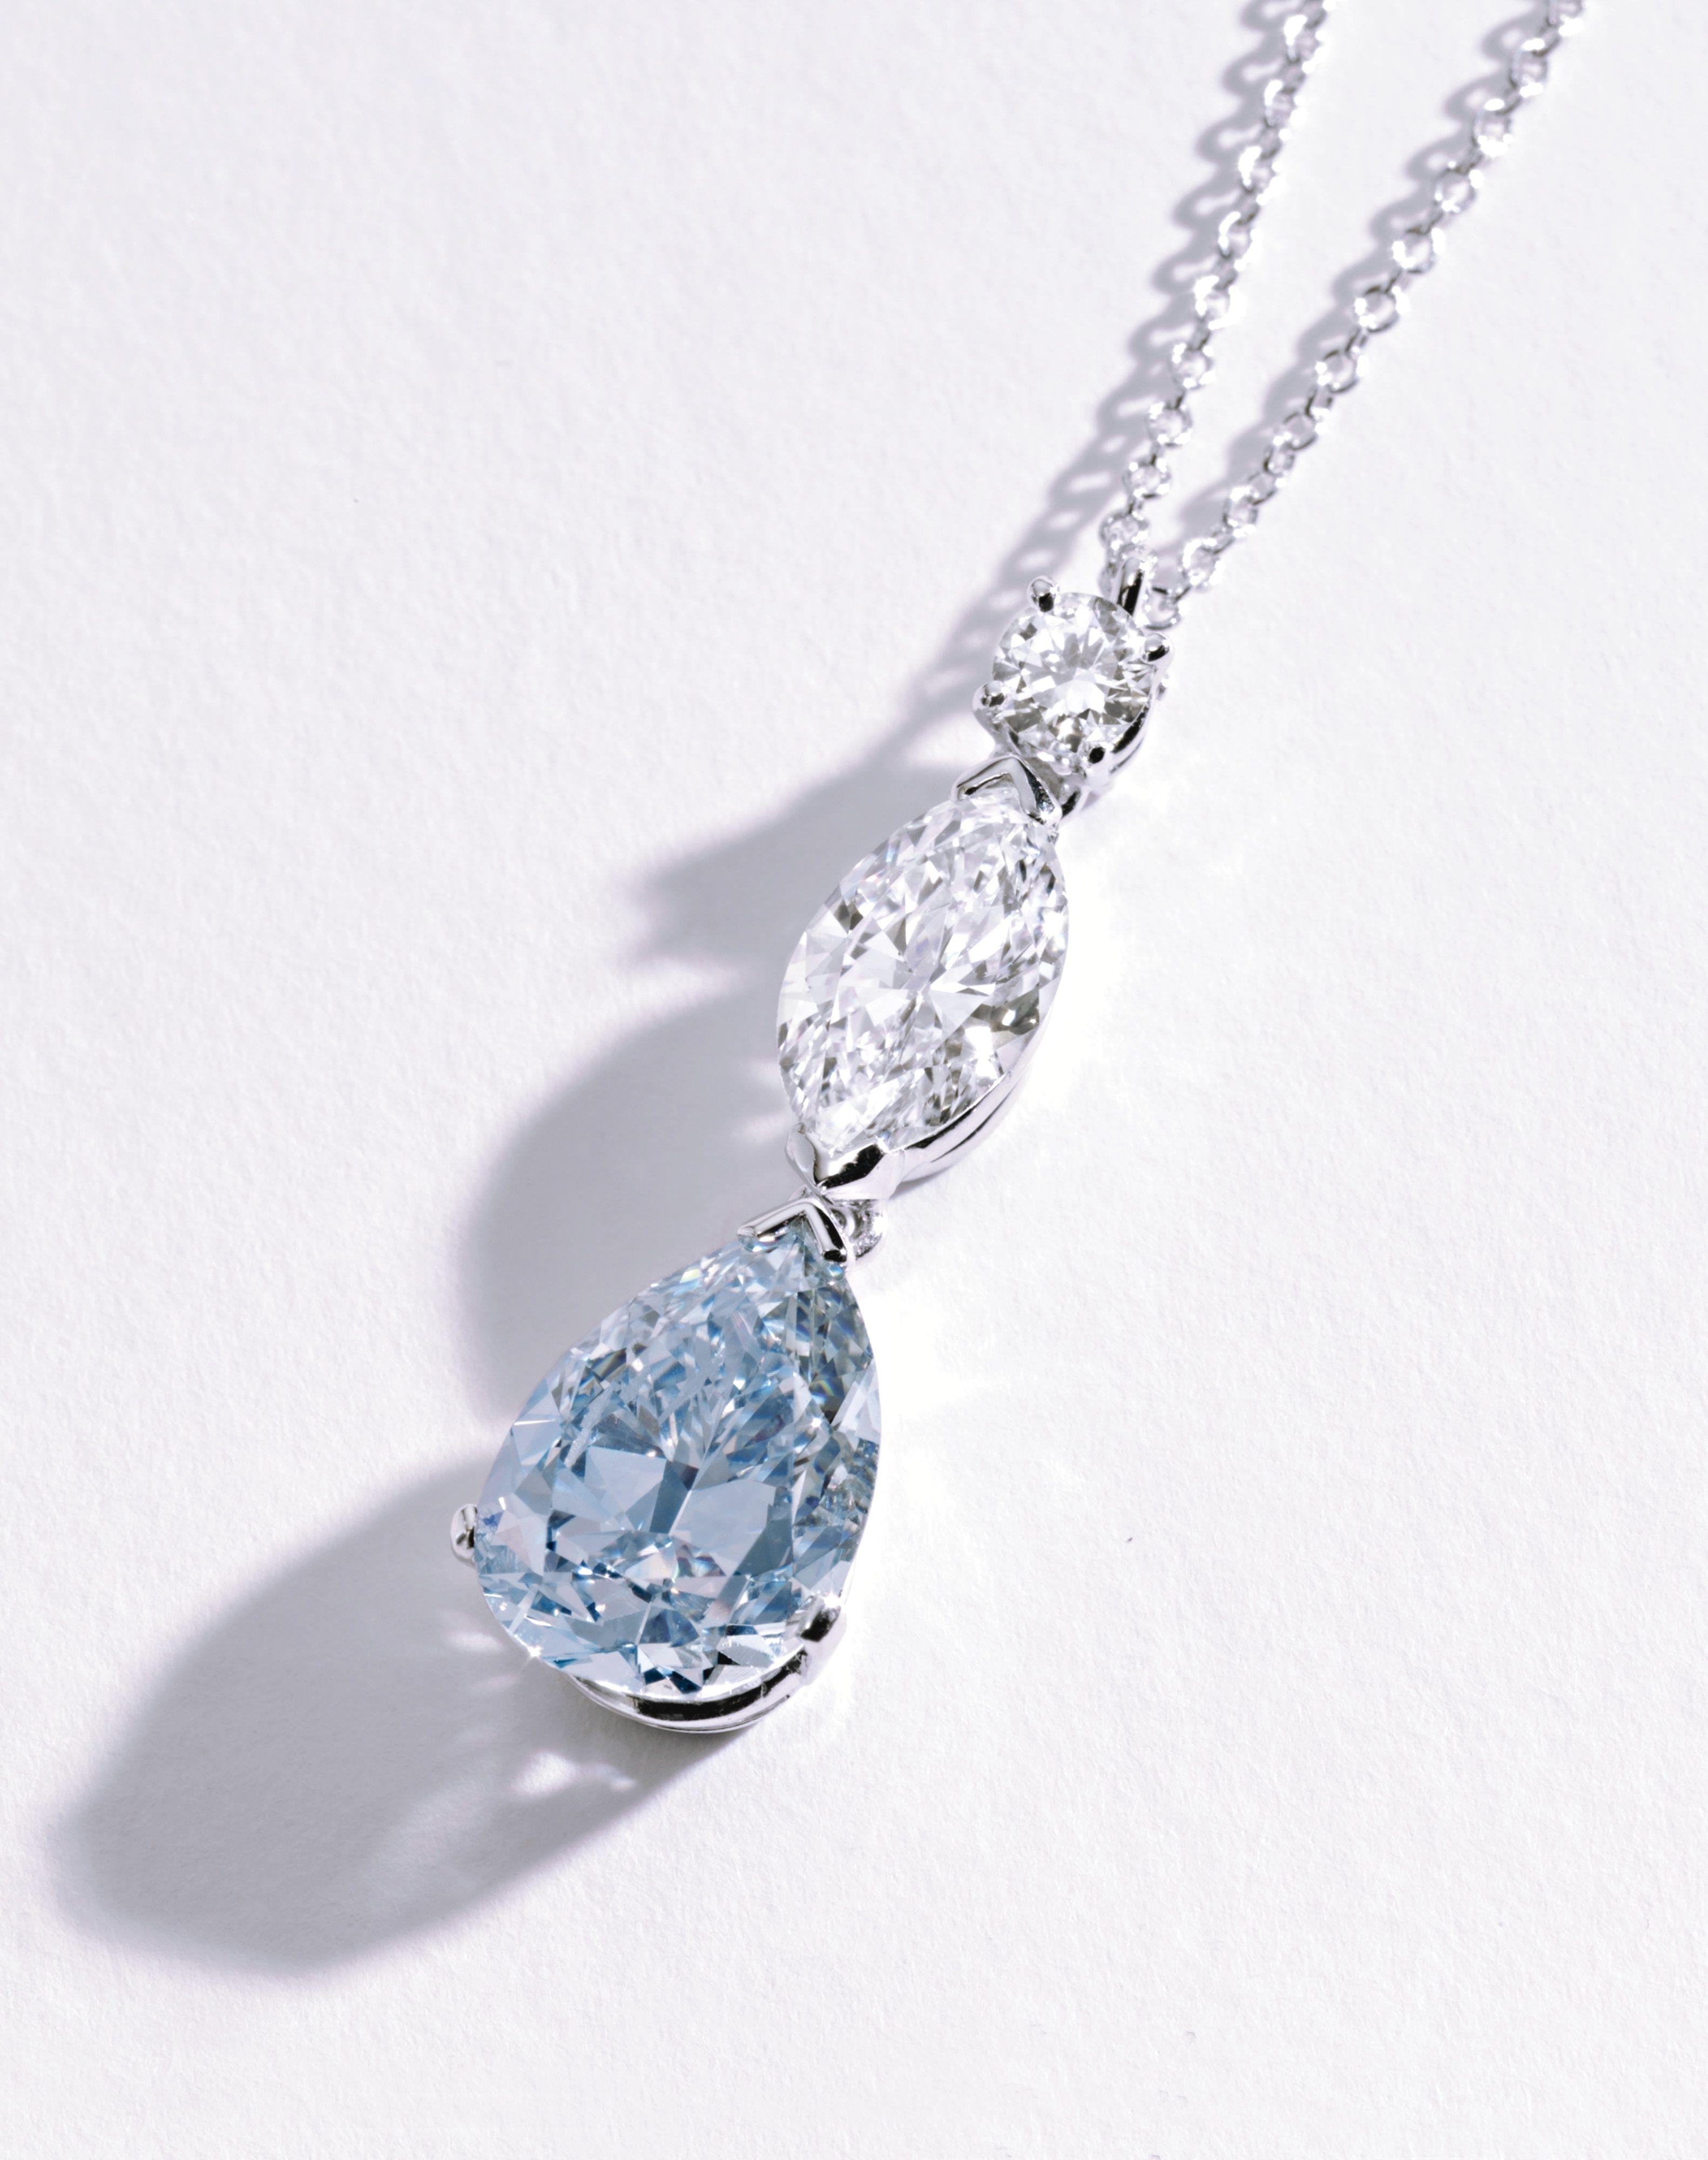 PLATINUM FANCY INTENSE BLUE & NEAR COLORLESS DIAMOND PENDANT